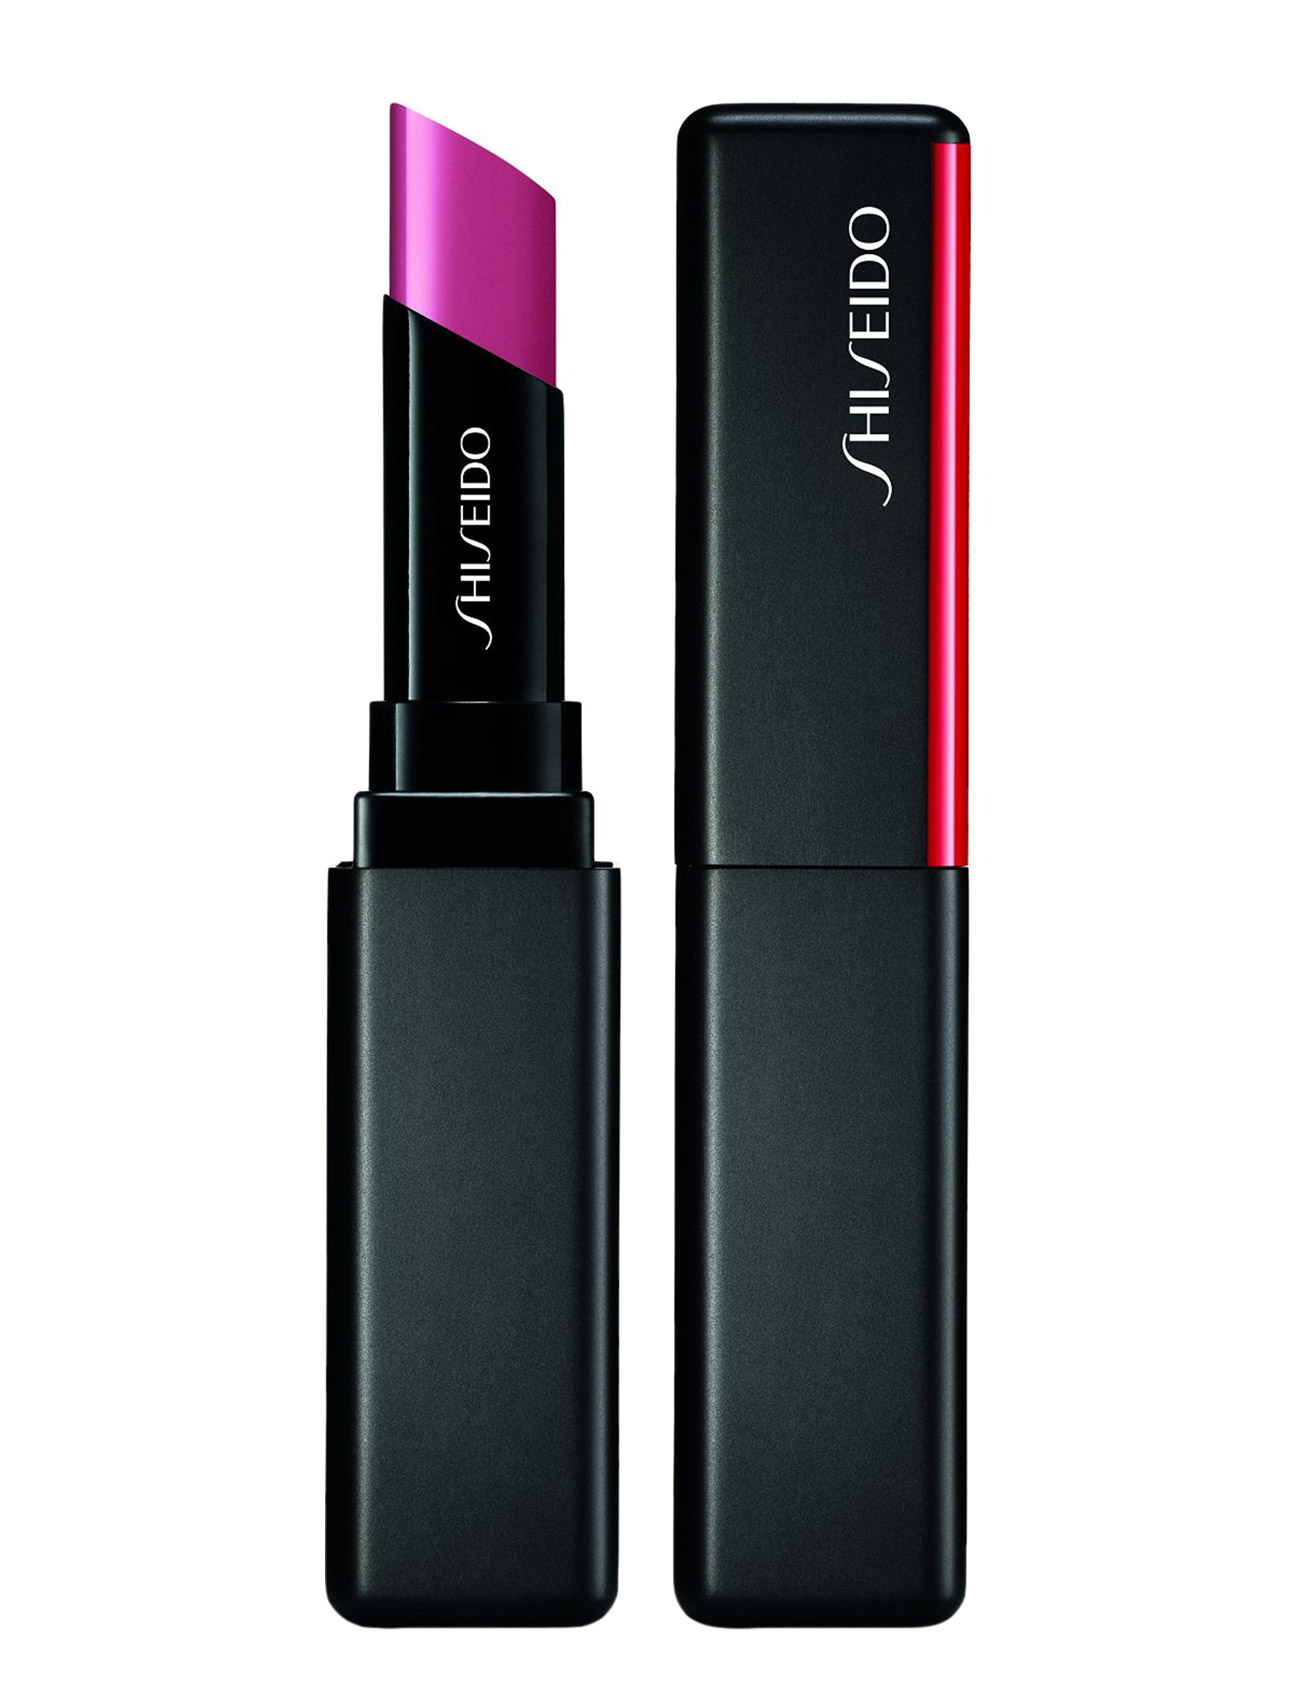 Image of Visionairy Gel Lipstick 207 Pink Dynasty Læbestift Makeup Lyserød Shiseido (3071142351)